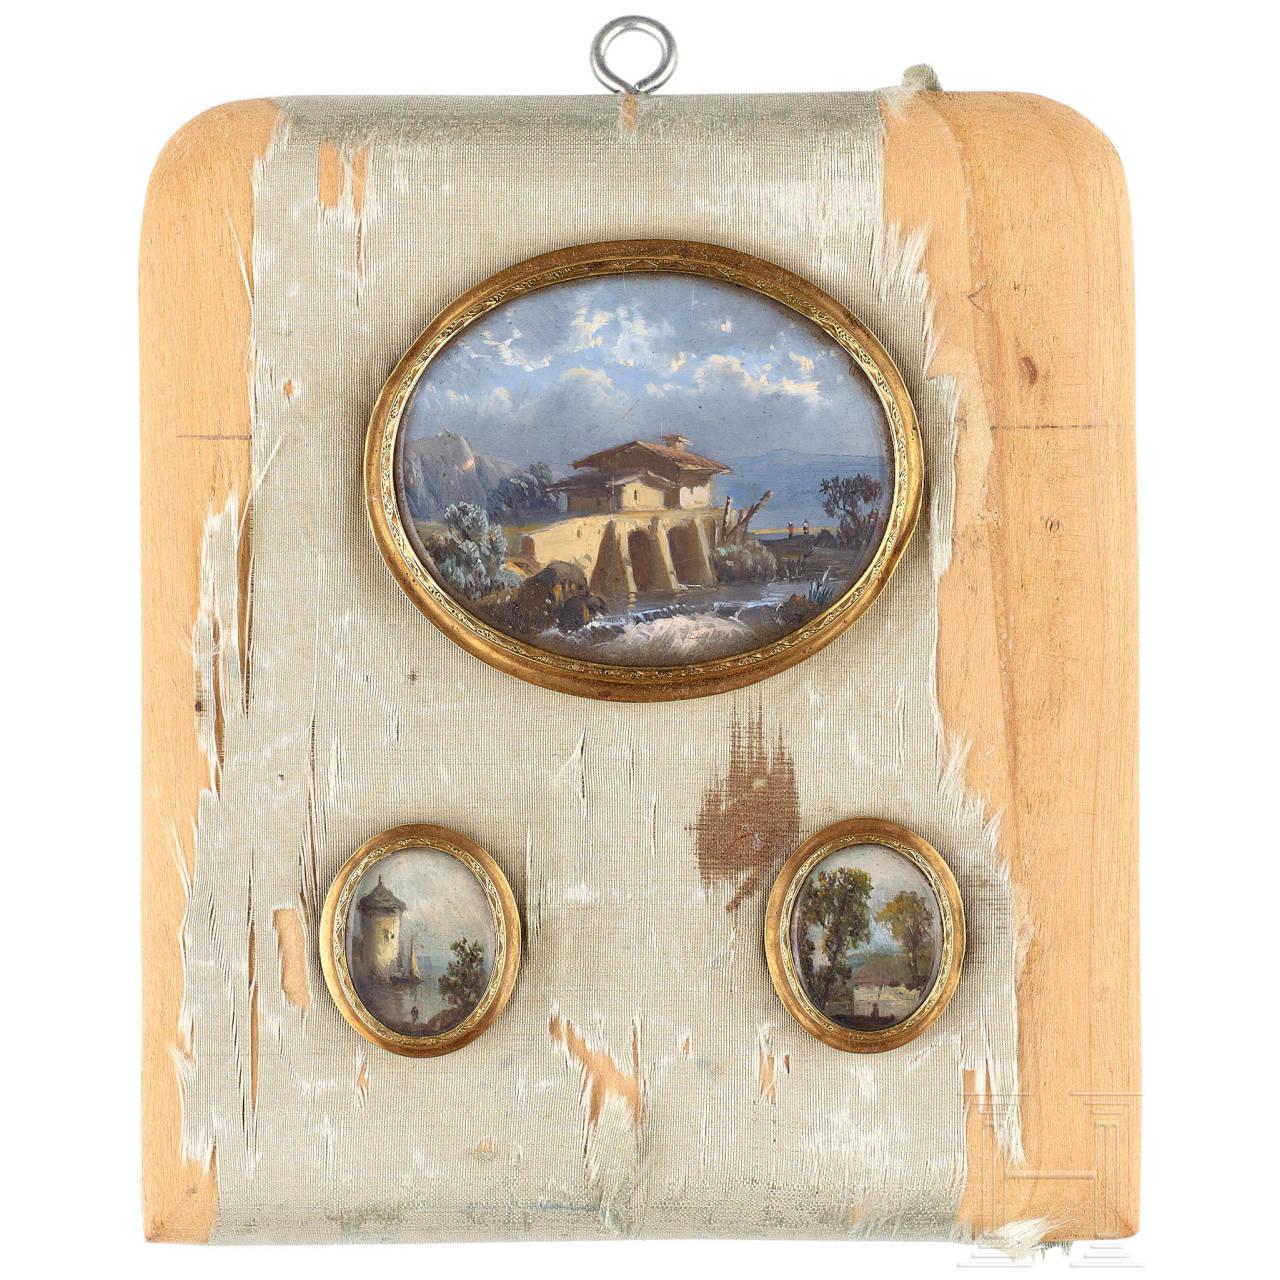 Satz von drei feinen, klassizistischen Miniaturen, Italien, Anfang 19. Jhdt.